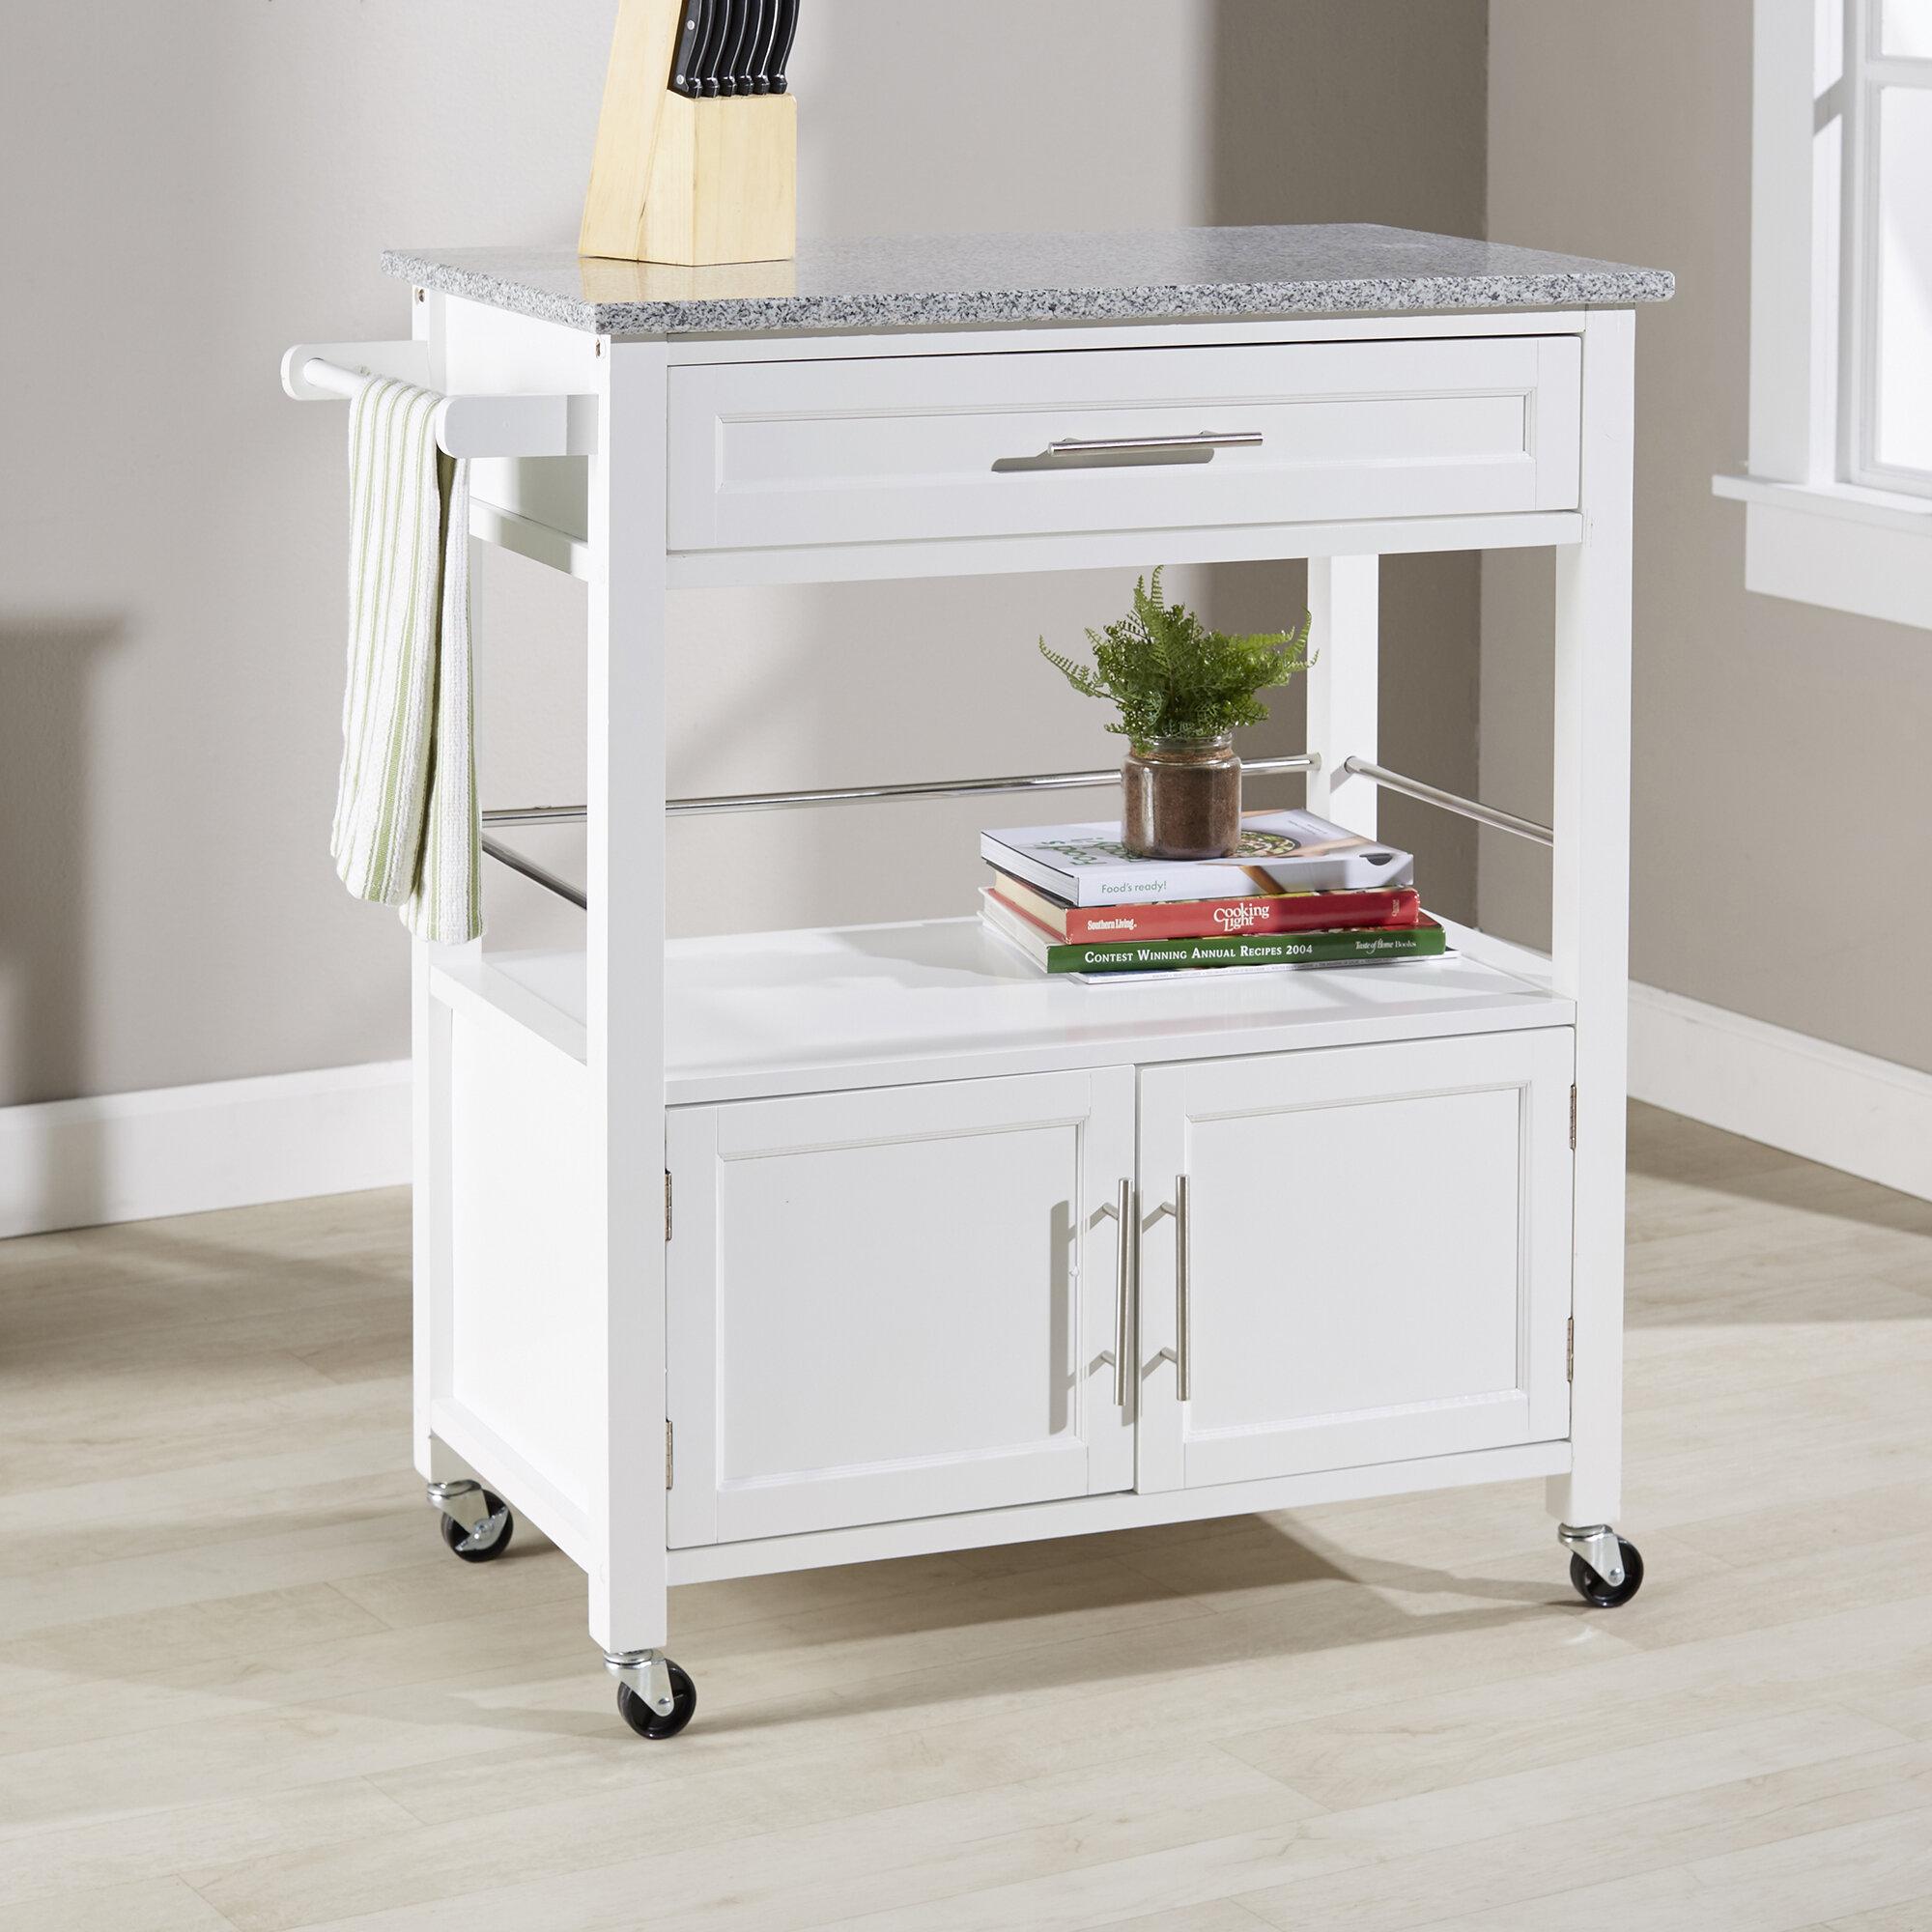 Latitude Run Jenuel Kitchen Cart With Granite Top And Locking Wheels Reviews Wayfair